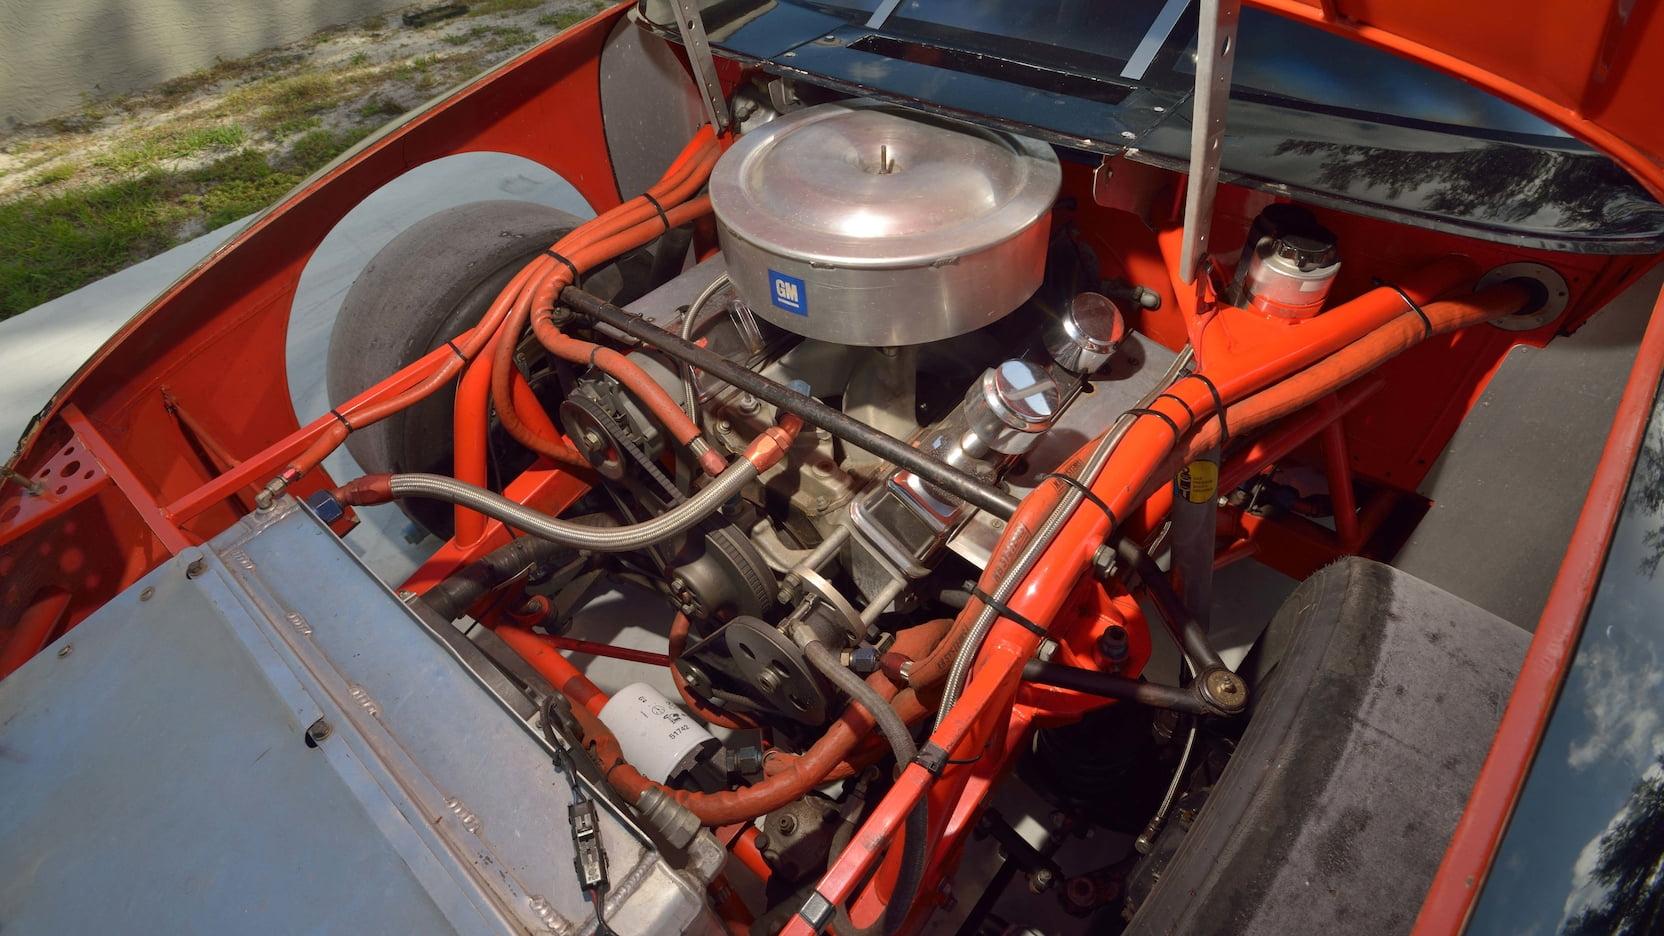 Chevrolet No. 3 Monte Carlo Dale Earnhardt engine